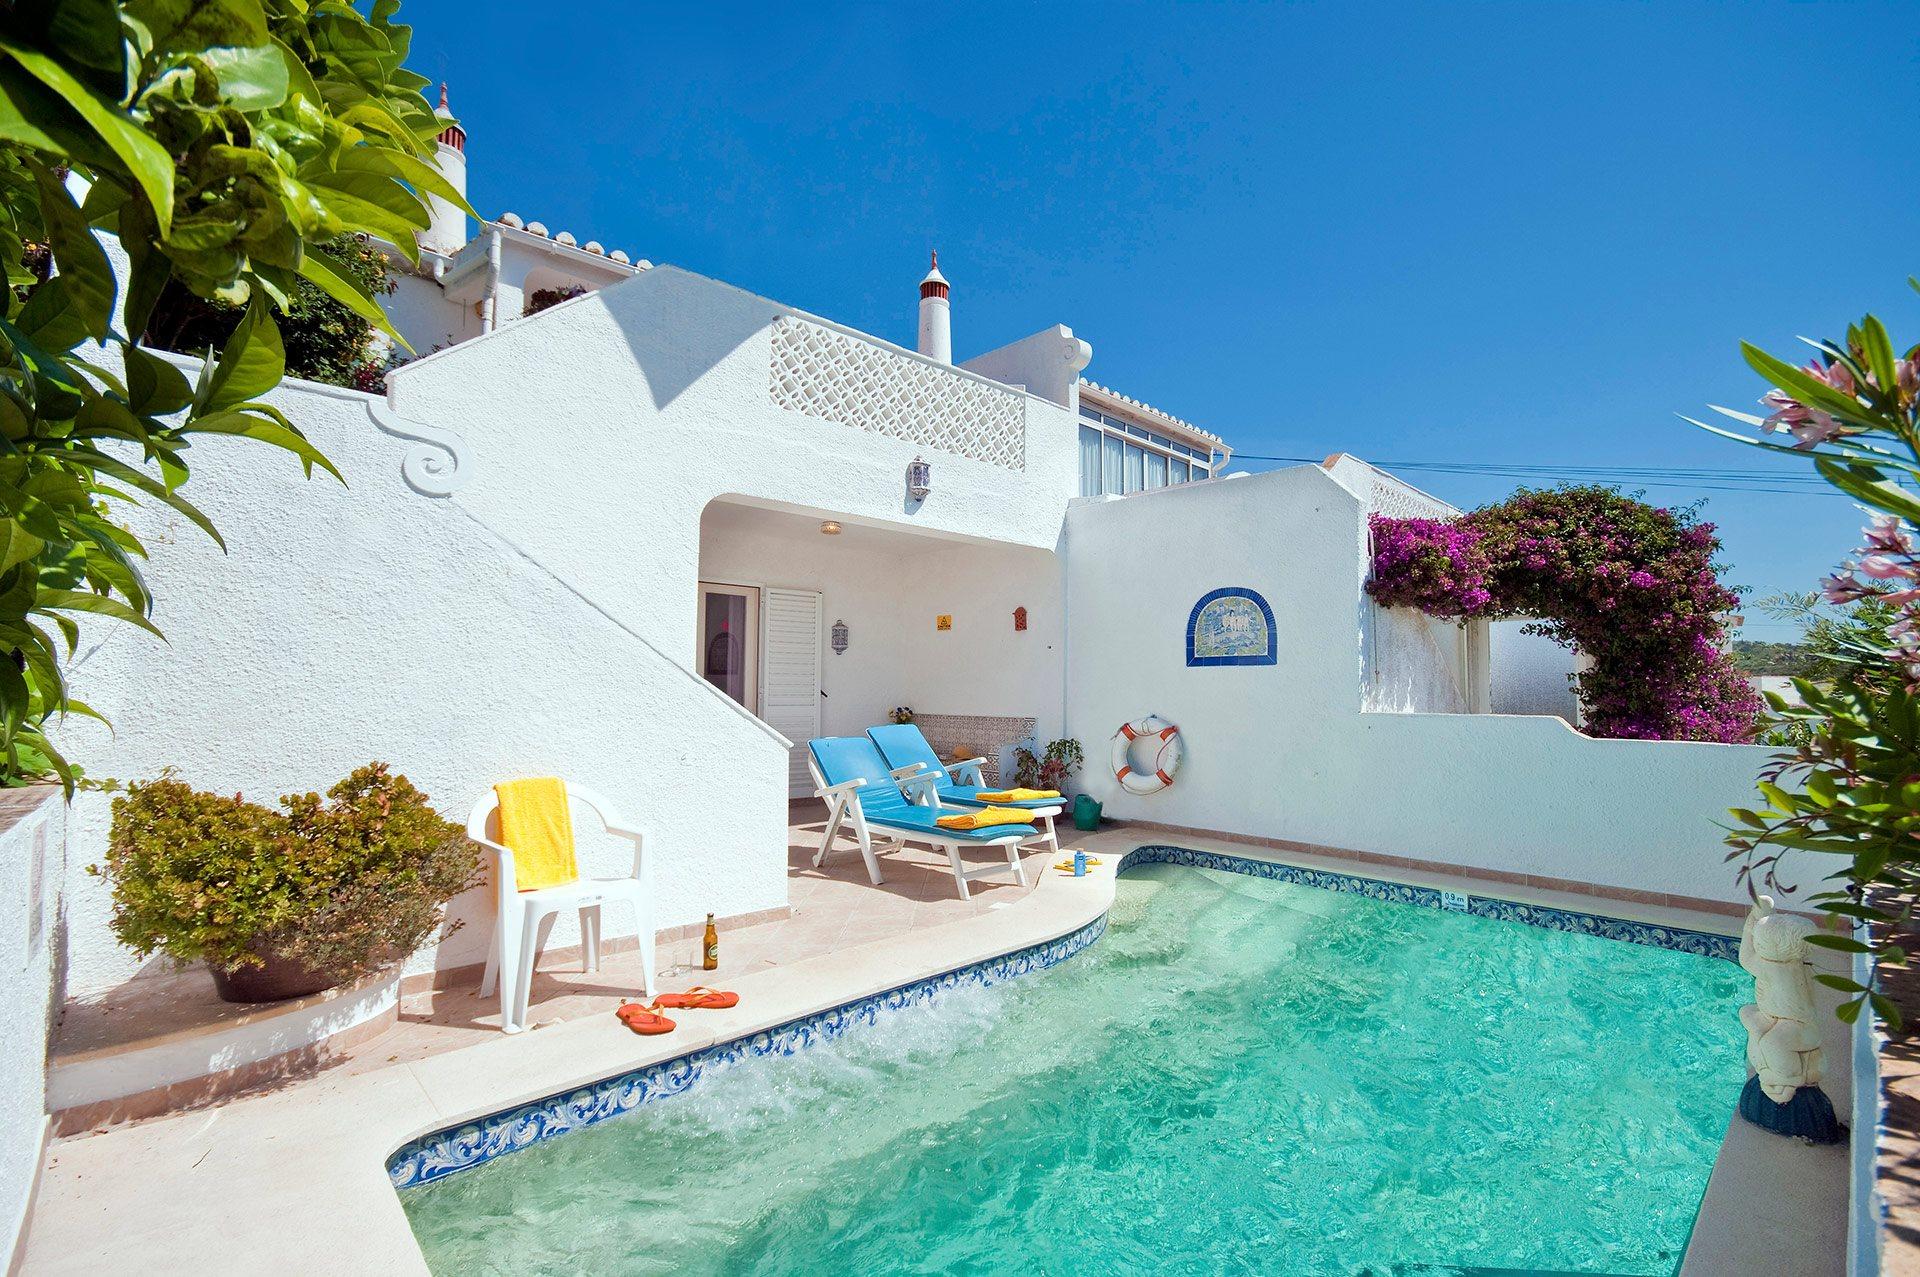 Villa Dos Anjinhos, Luz, Algarve, Portugal